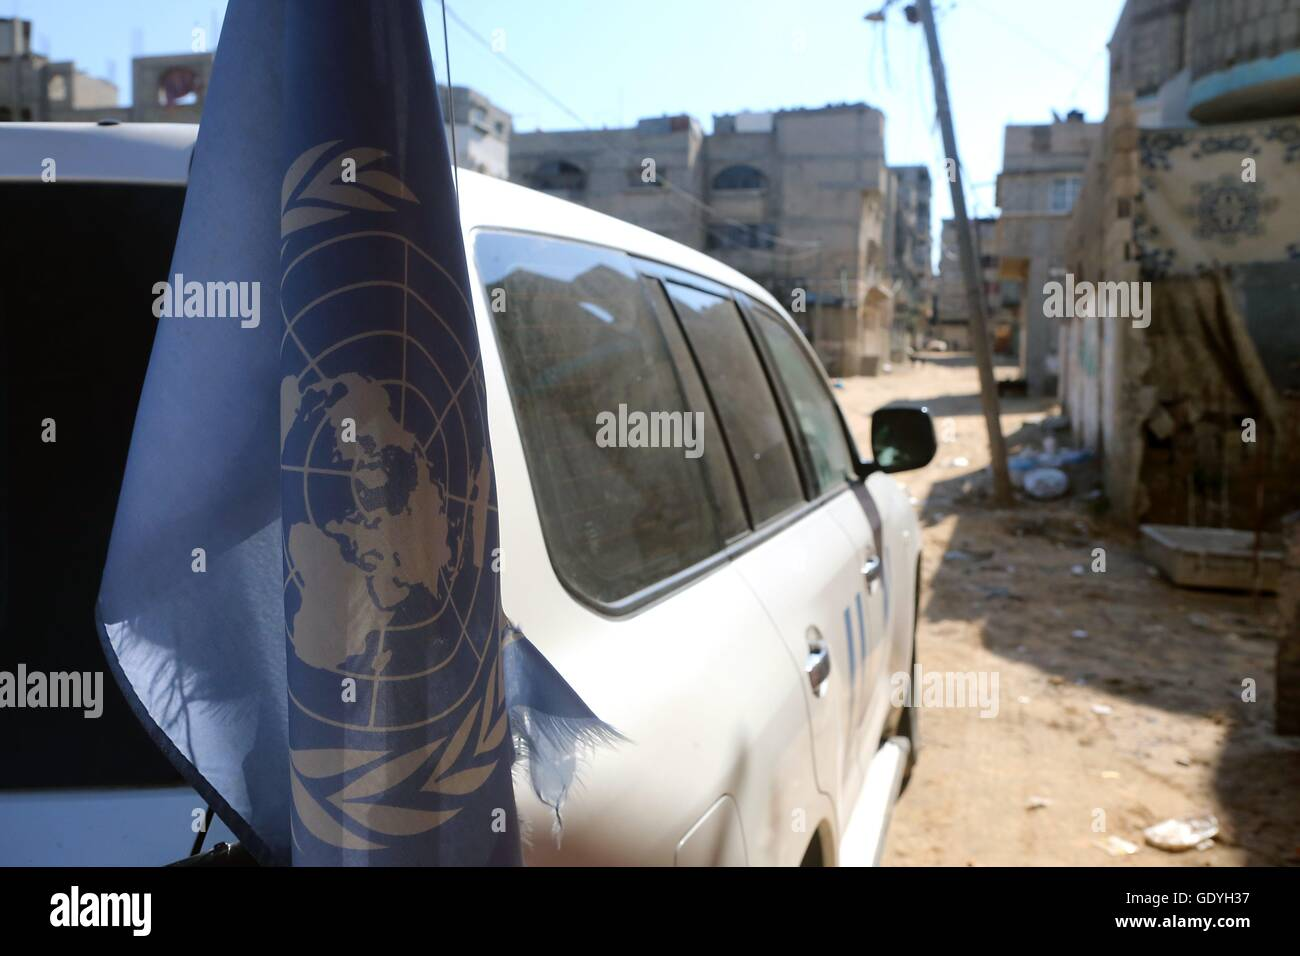 UN vehicle in Gaza City. Street scene in Gaza City. The Gaza Strip is a coastal region on the eastern Mediterranean - Stock Image